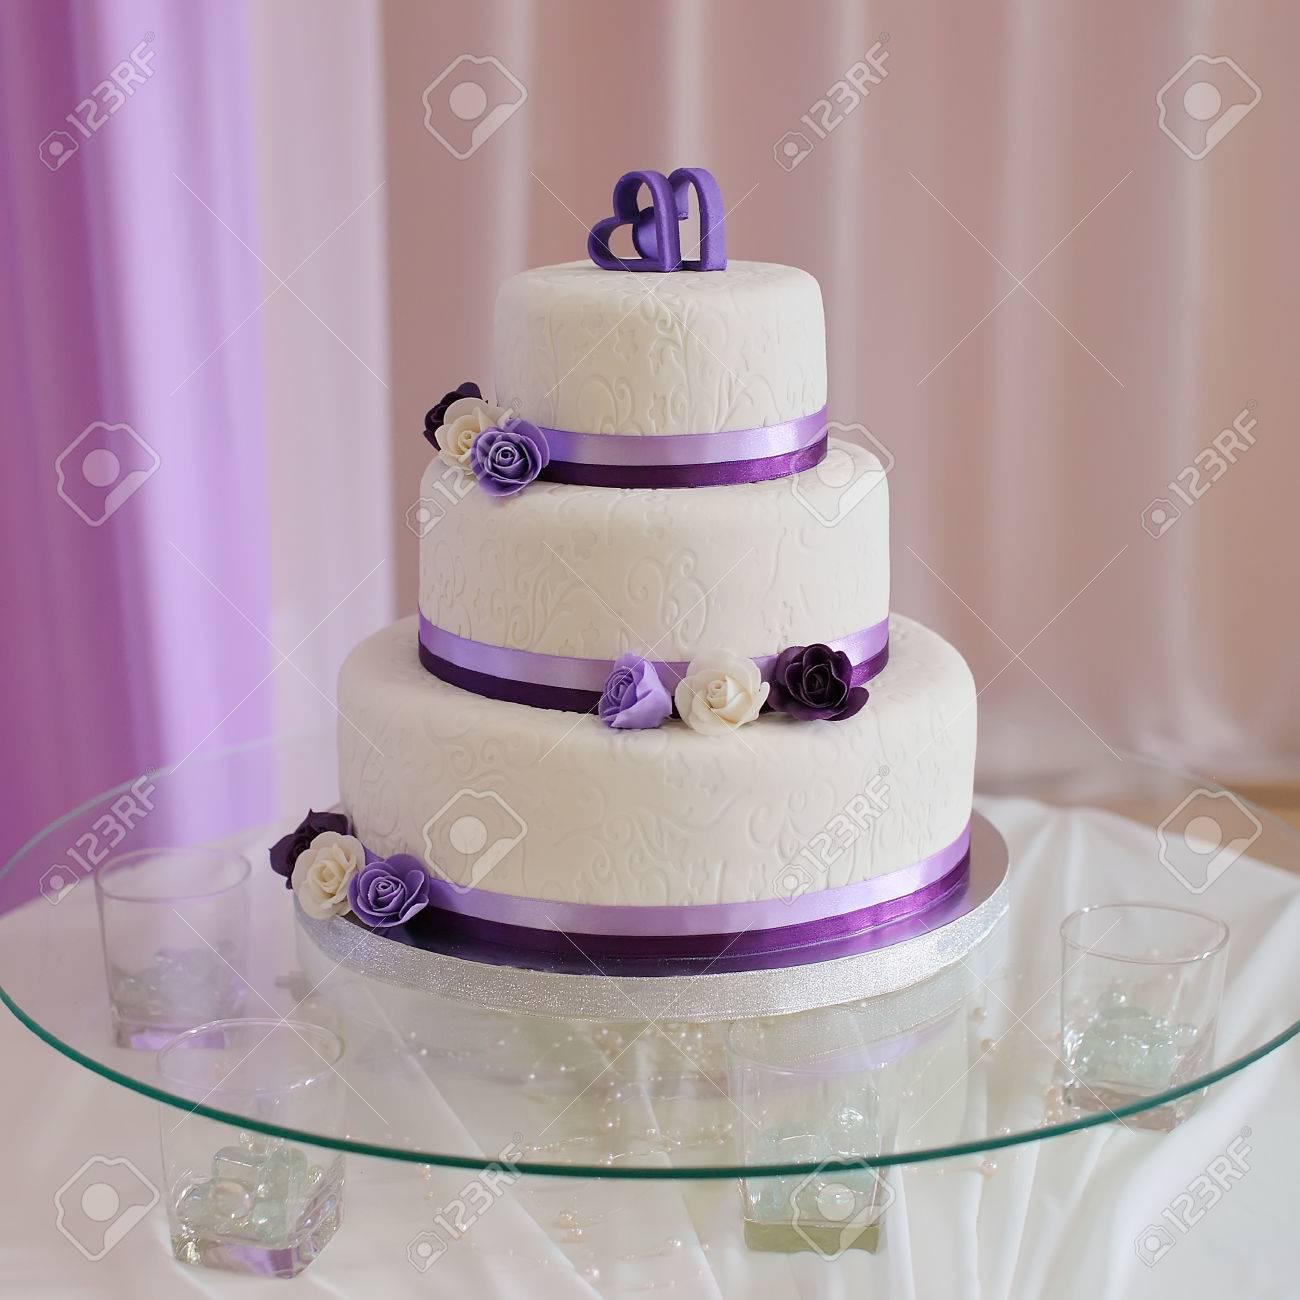 White wedding cake with purple flower detail stock photo picture stock photo white wedding cake with purple flower detail mightylinksfo